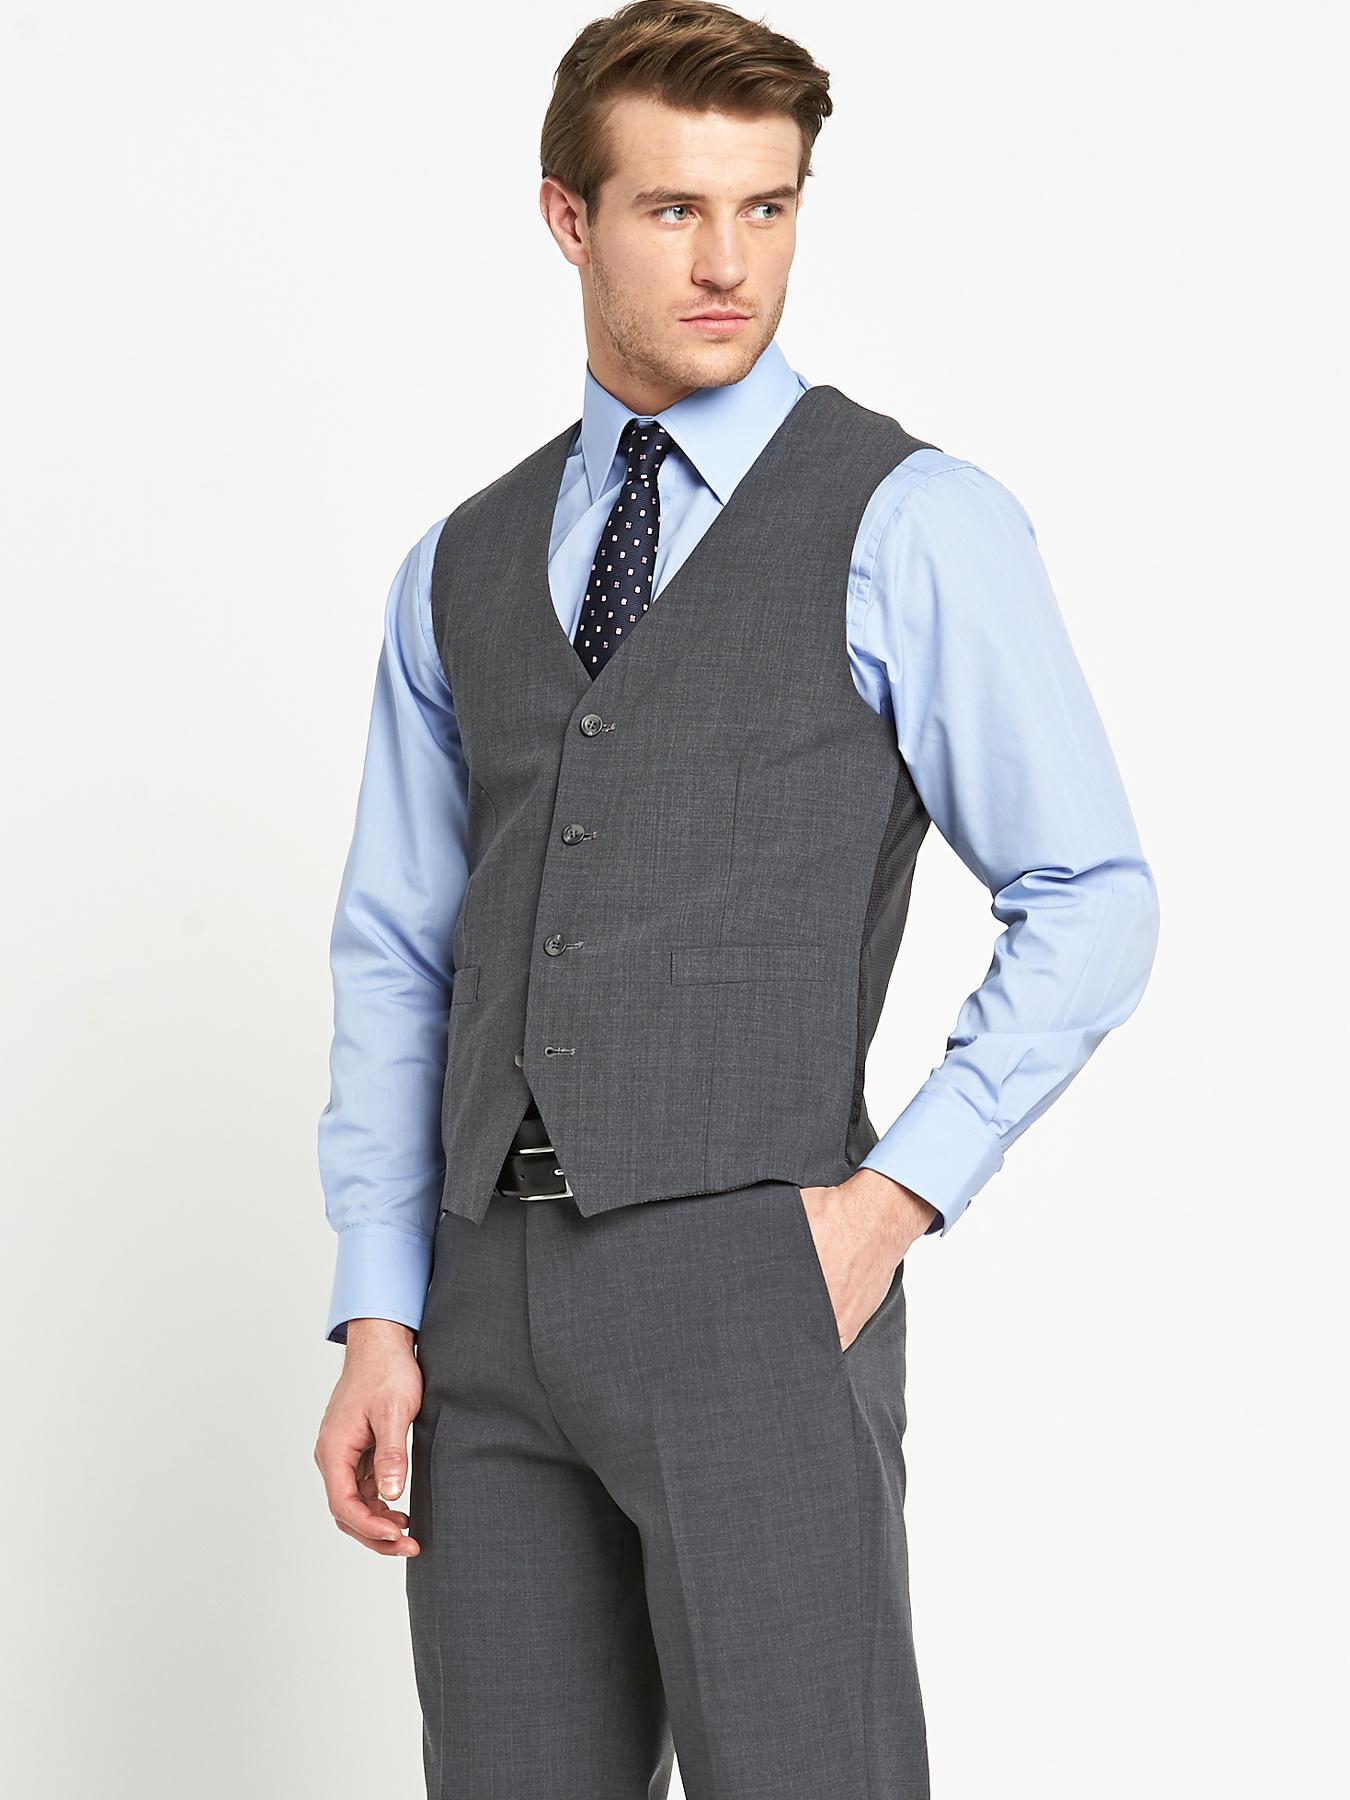 Skopes Mens Otis Suit Waistcoat - Grey - Grey, Grey